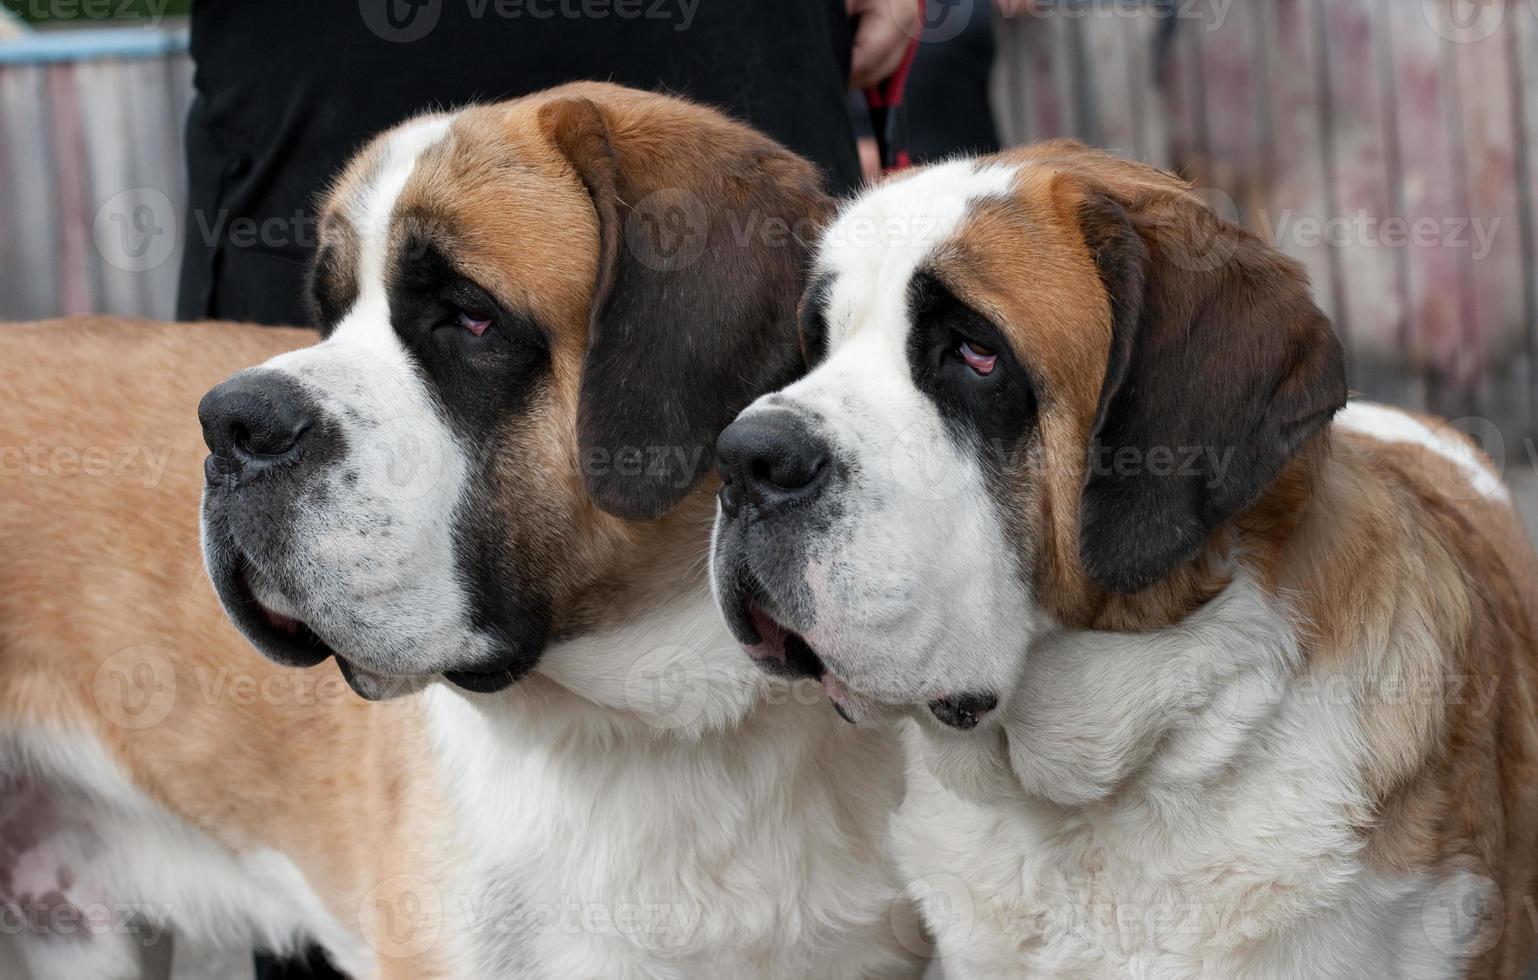 coppia di cani di razza San Bernardo foto